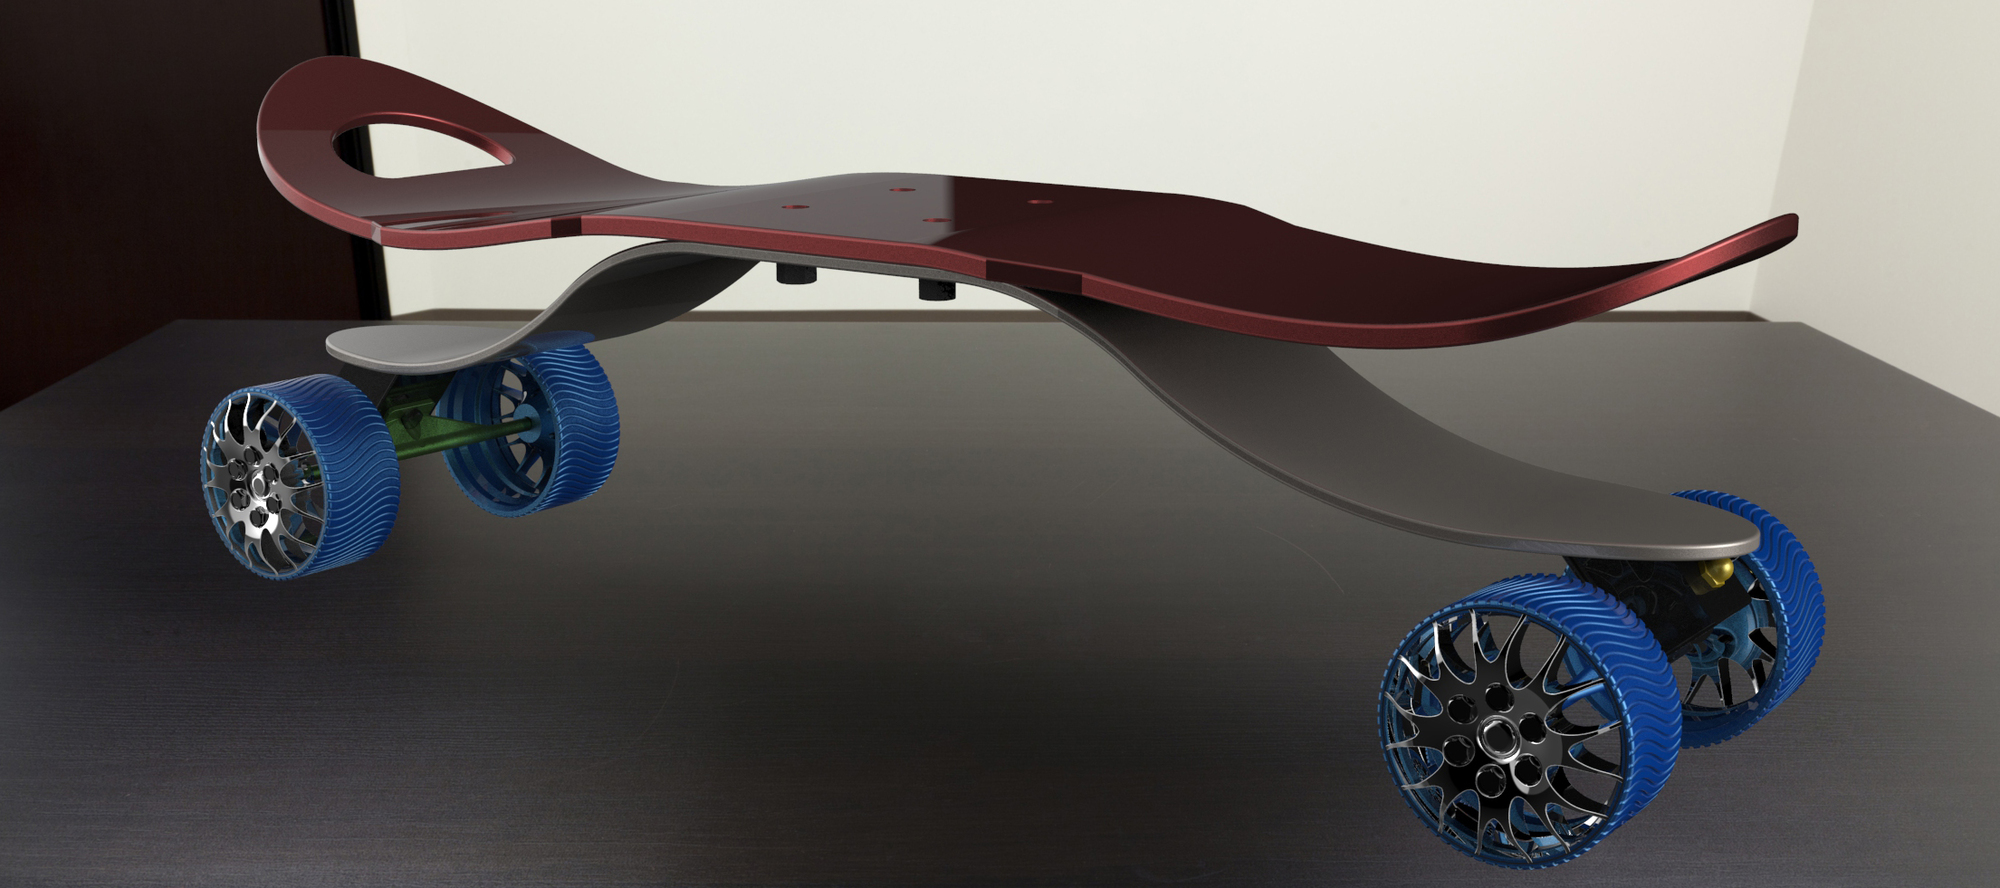 Skateboard assly autodesk online gallery - Invention du skateboard ...